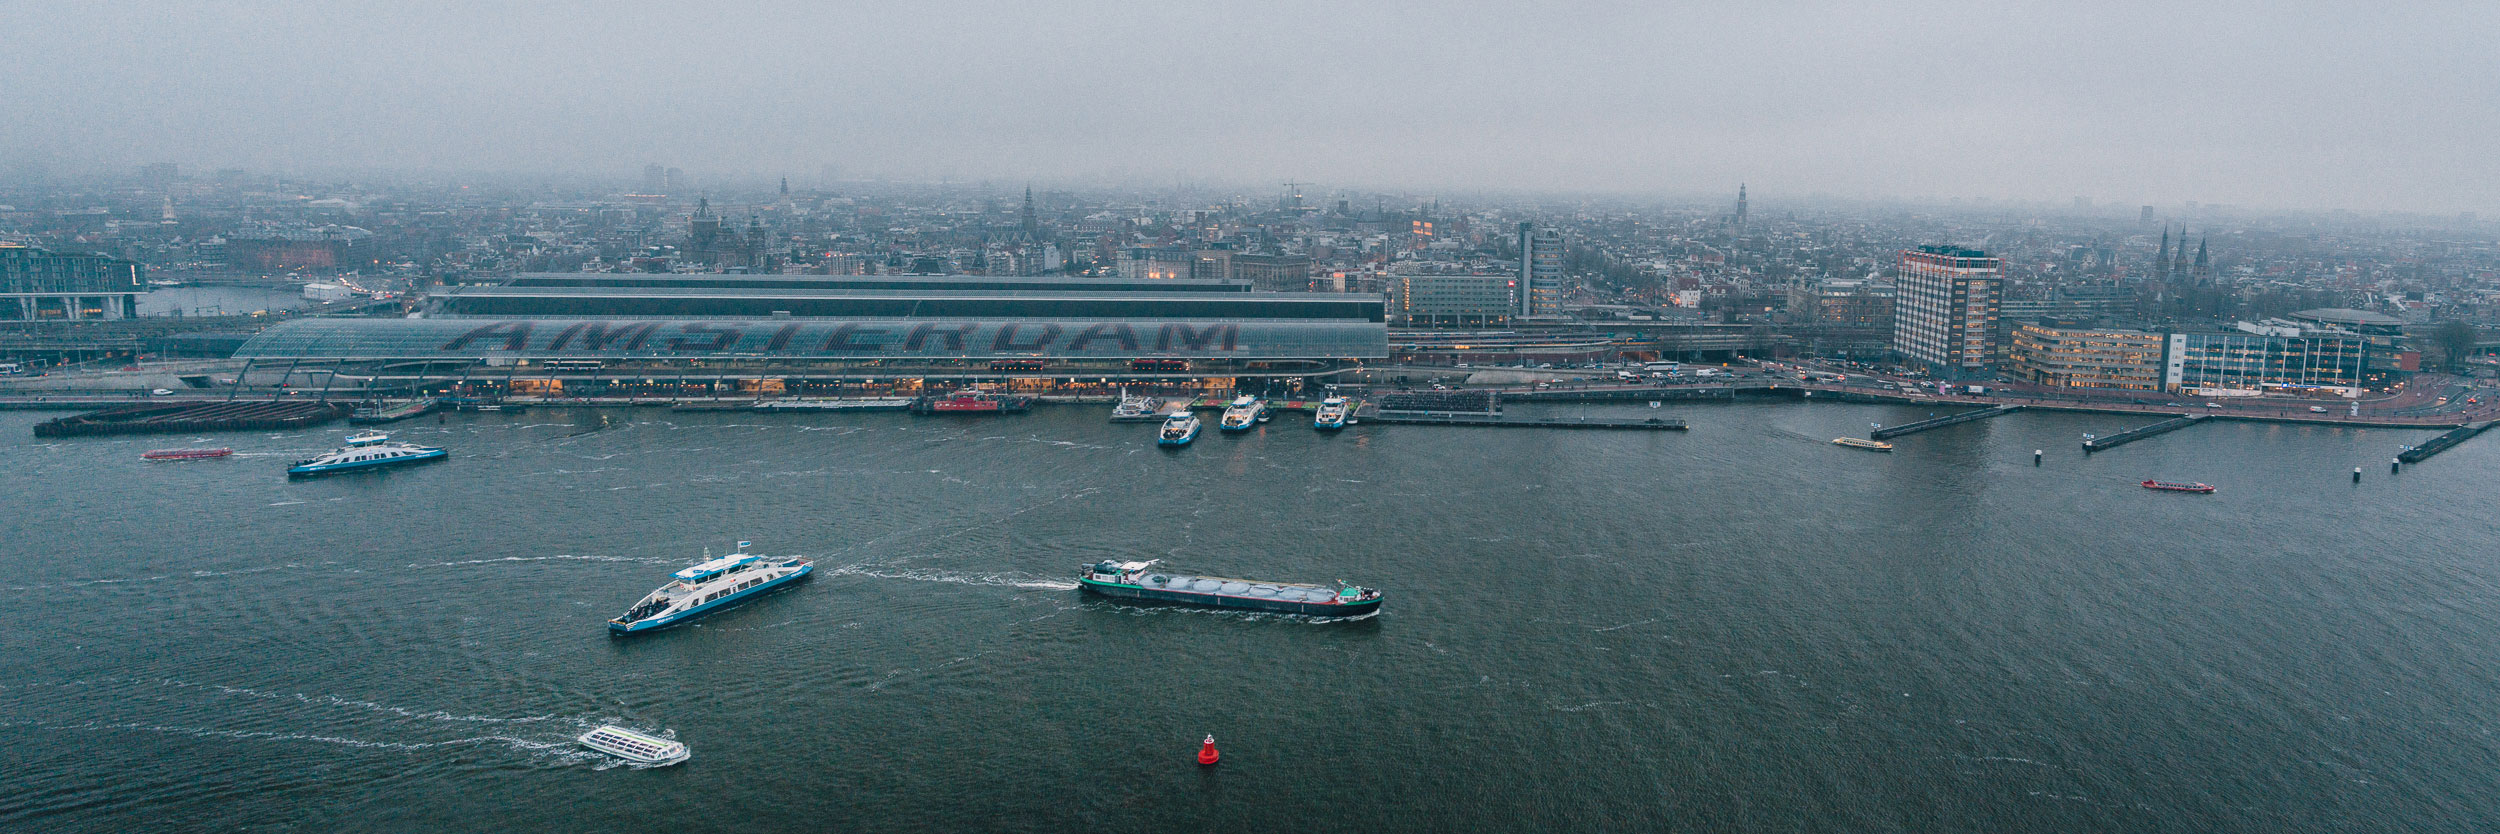 Uitzicht over Amsterdam vanaf de A'DAM toren